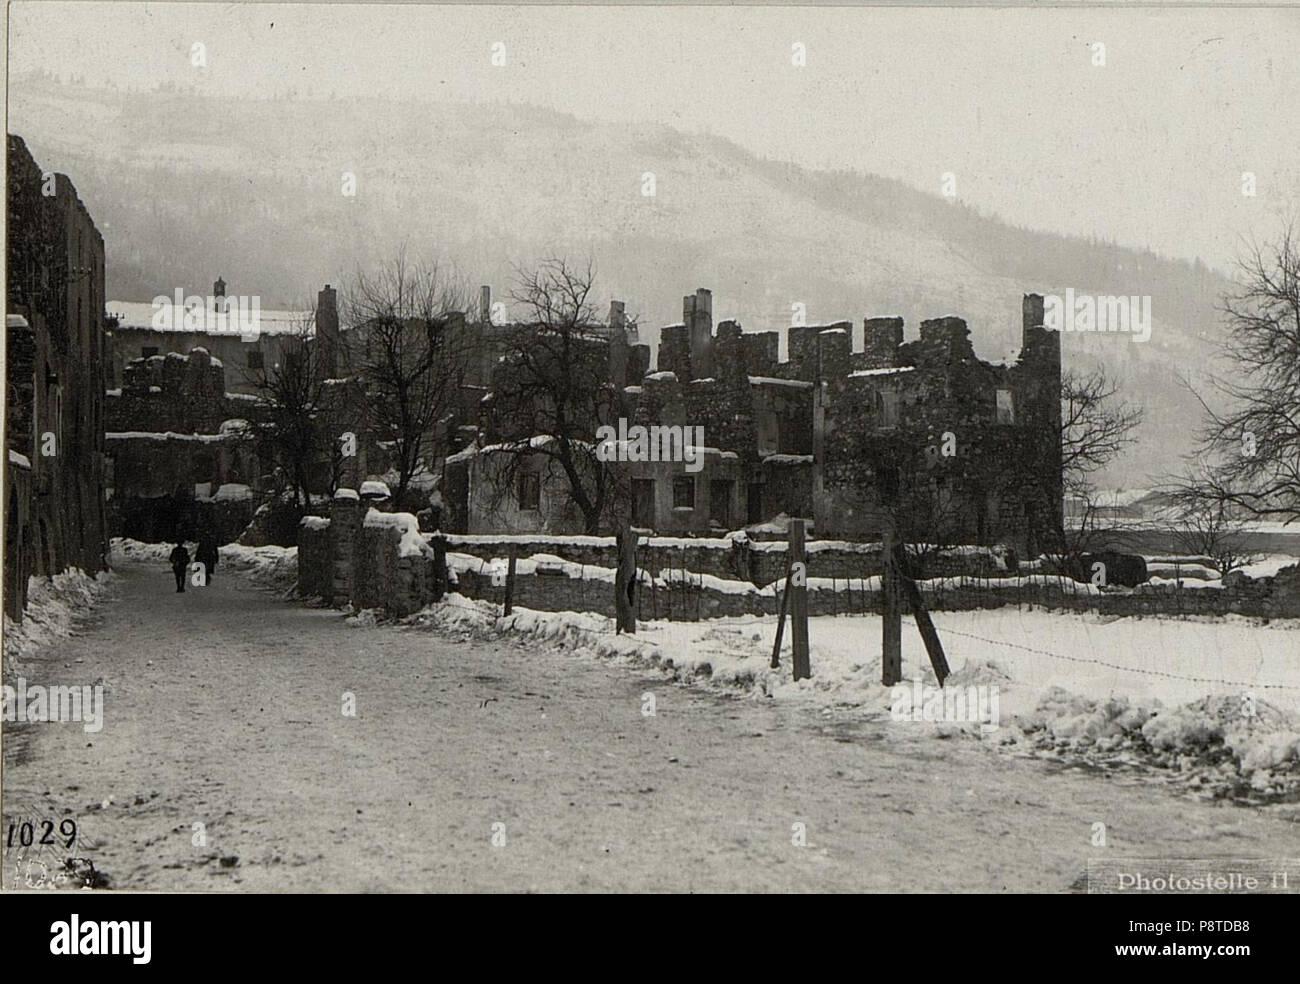 Abgebrannte Häuser. (BildID 15639508)   Stock Image